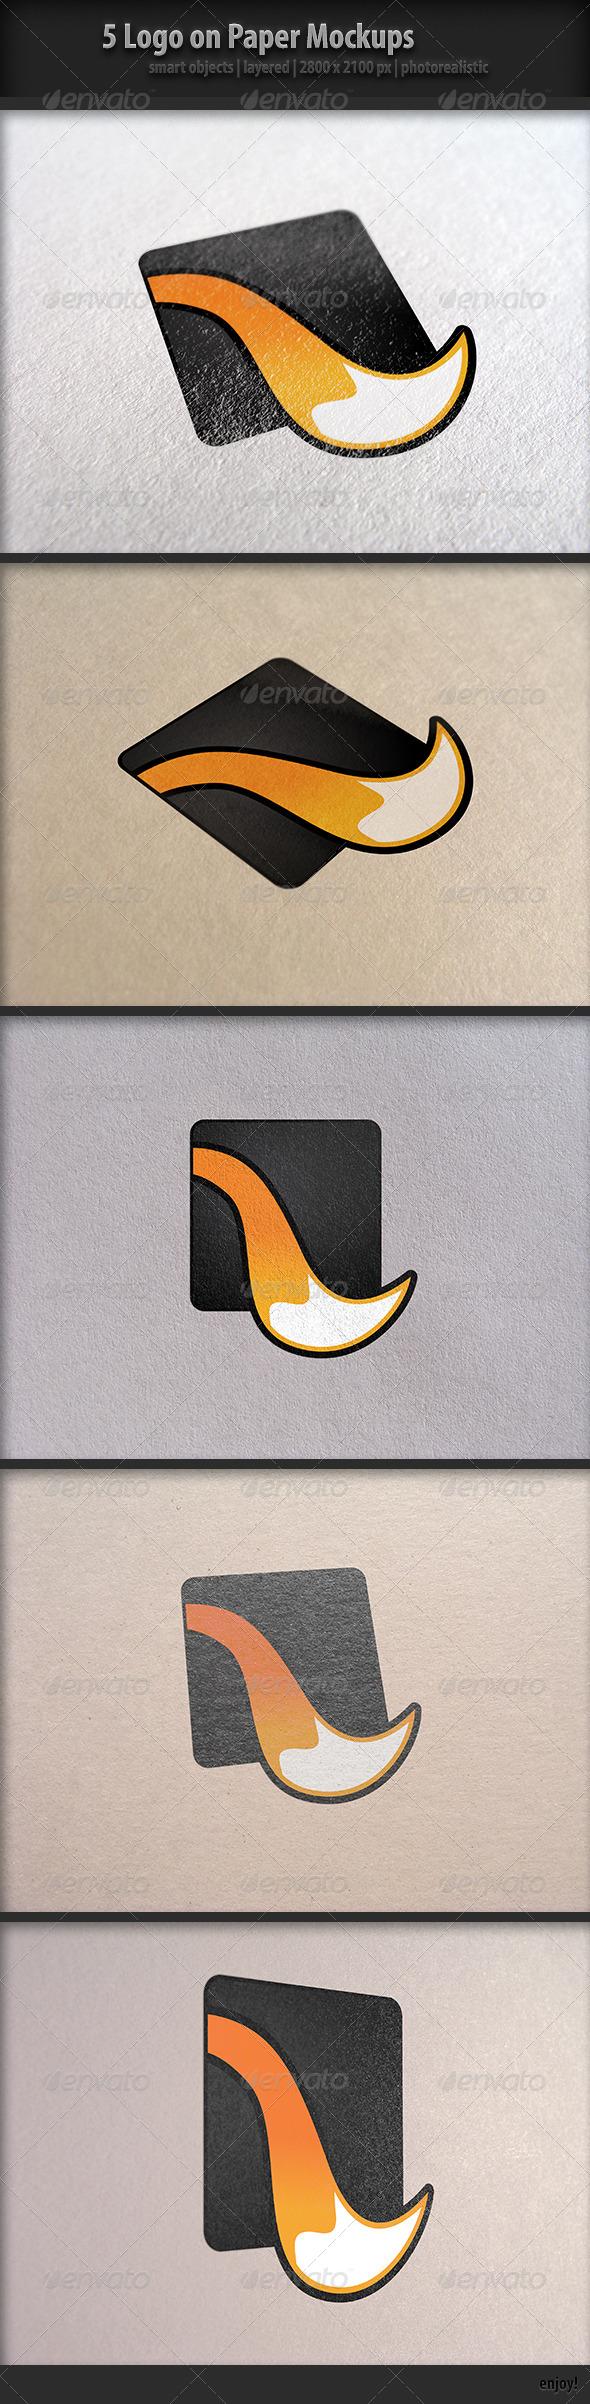 5 Logo on Paper Mock-Ups - Logo Product Mock-Ups